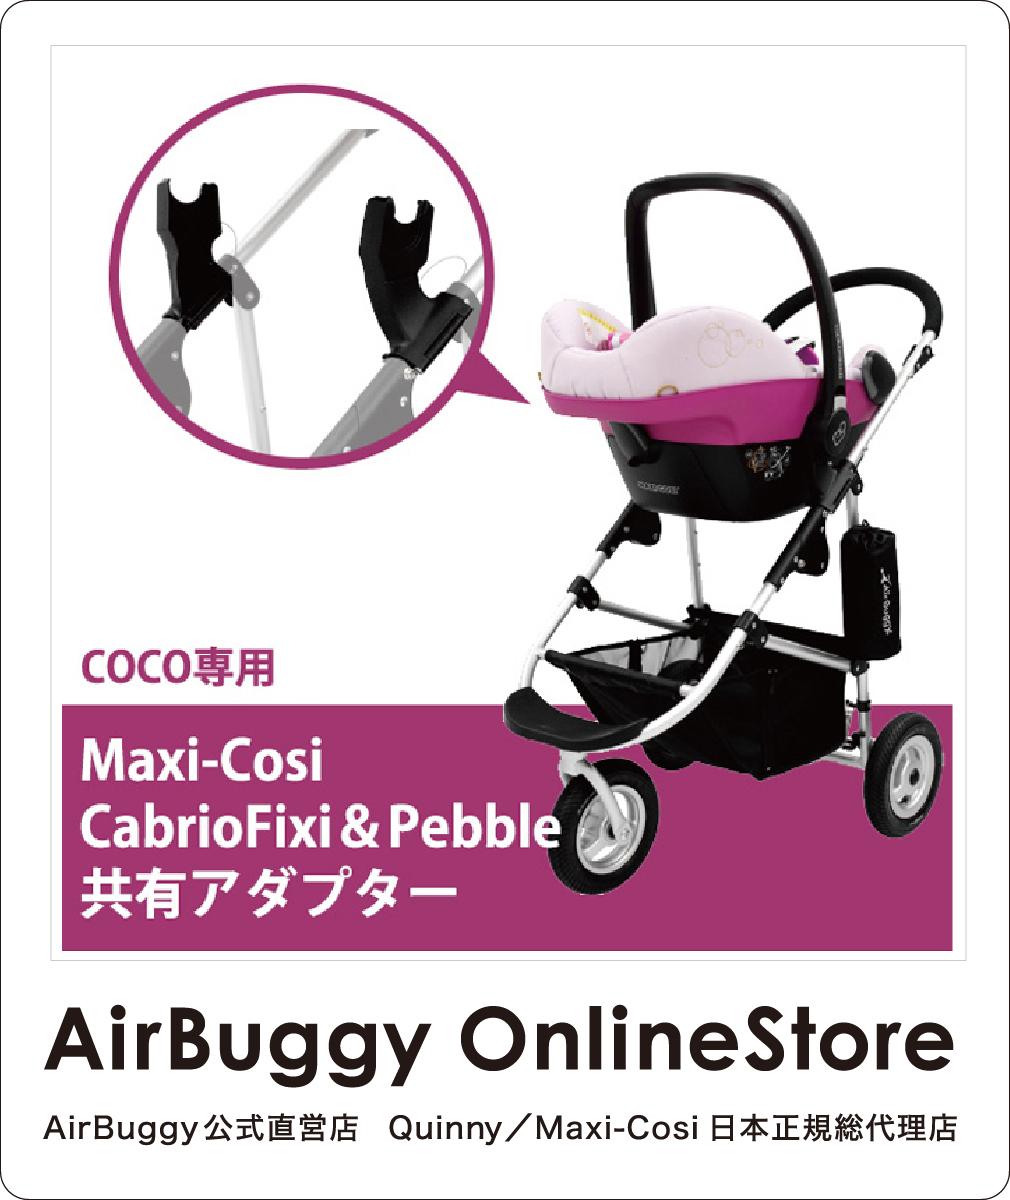 AirBuggy Maxi-cosi 連接器(預購)